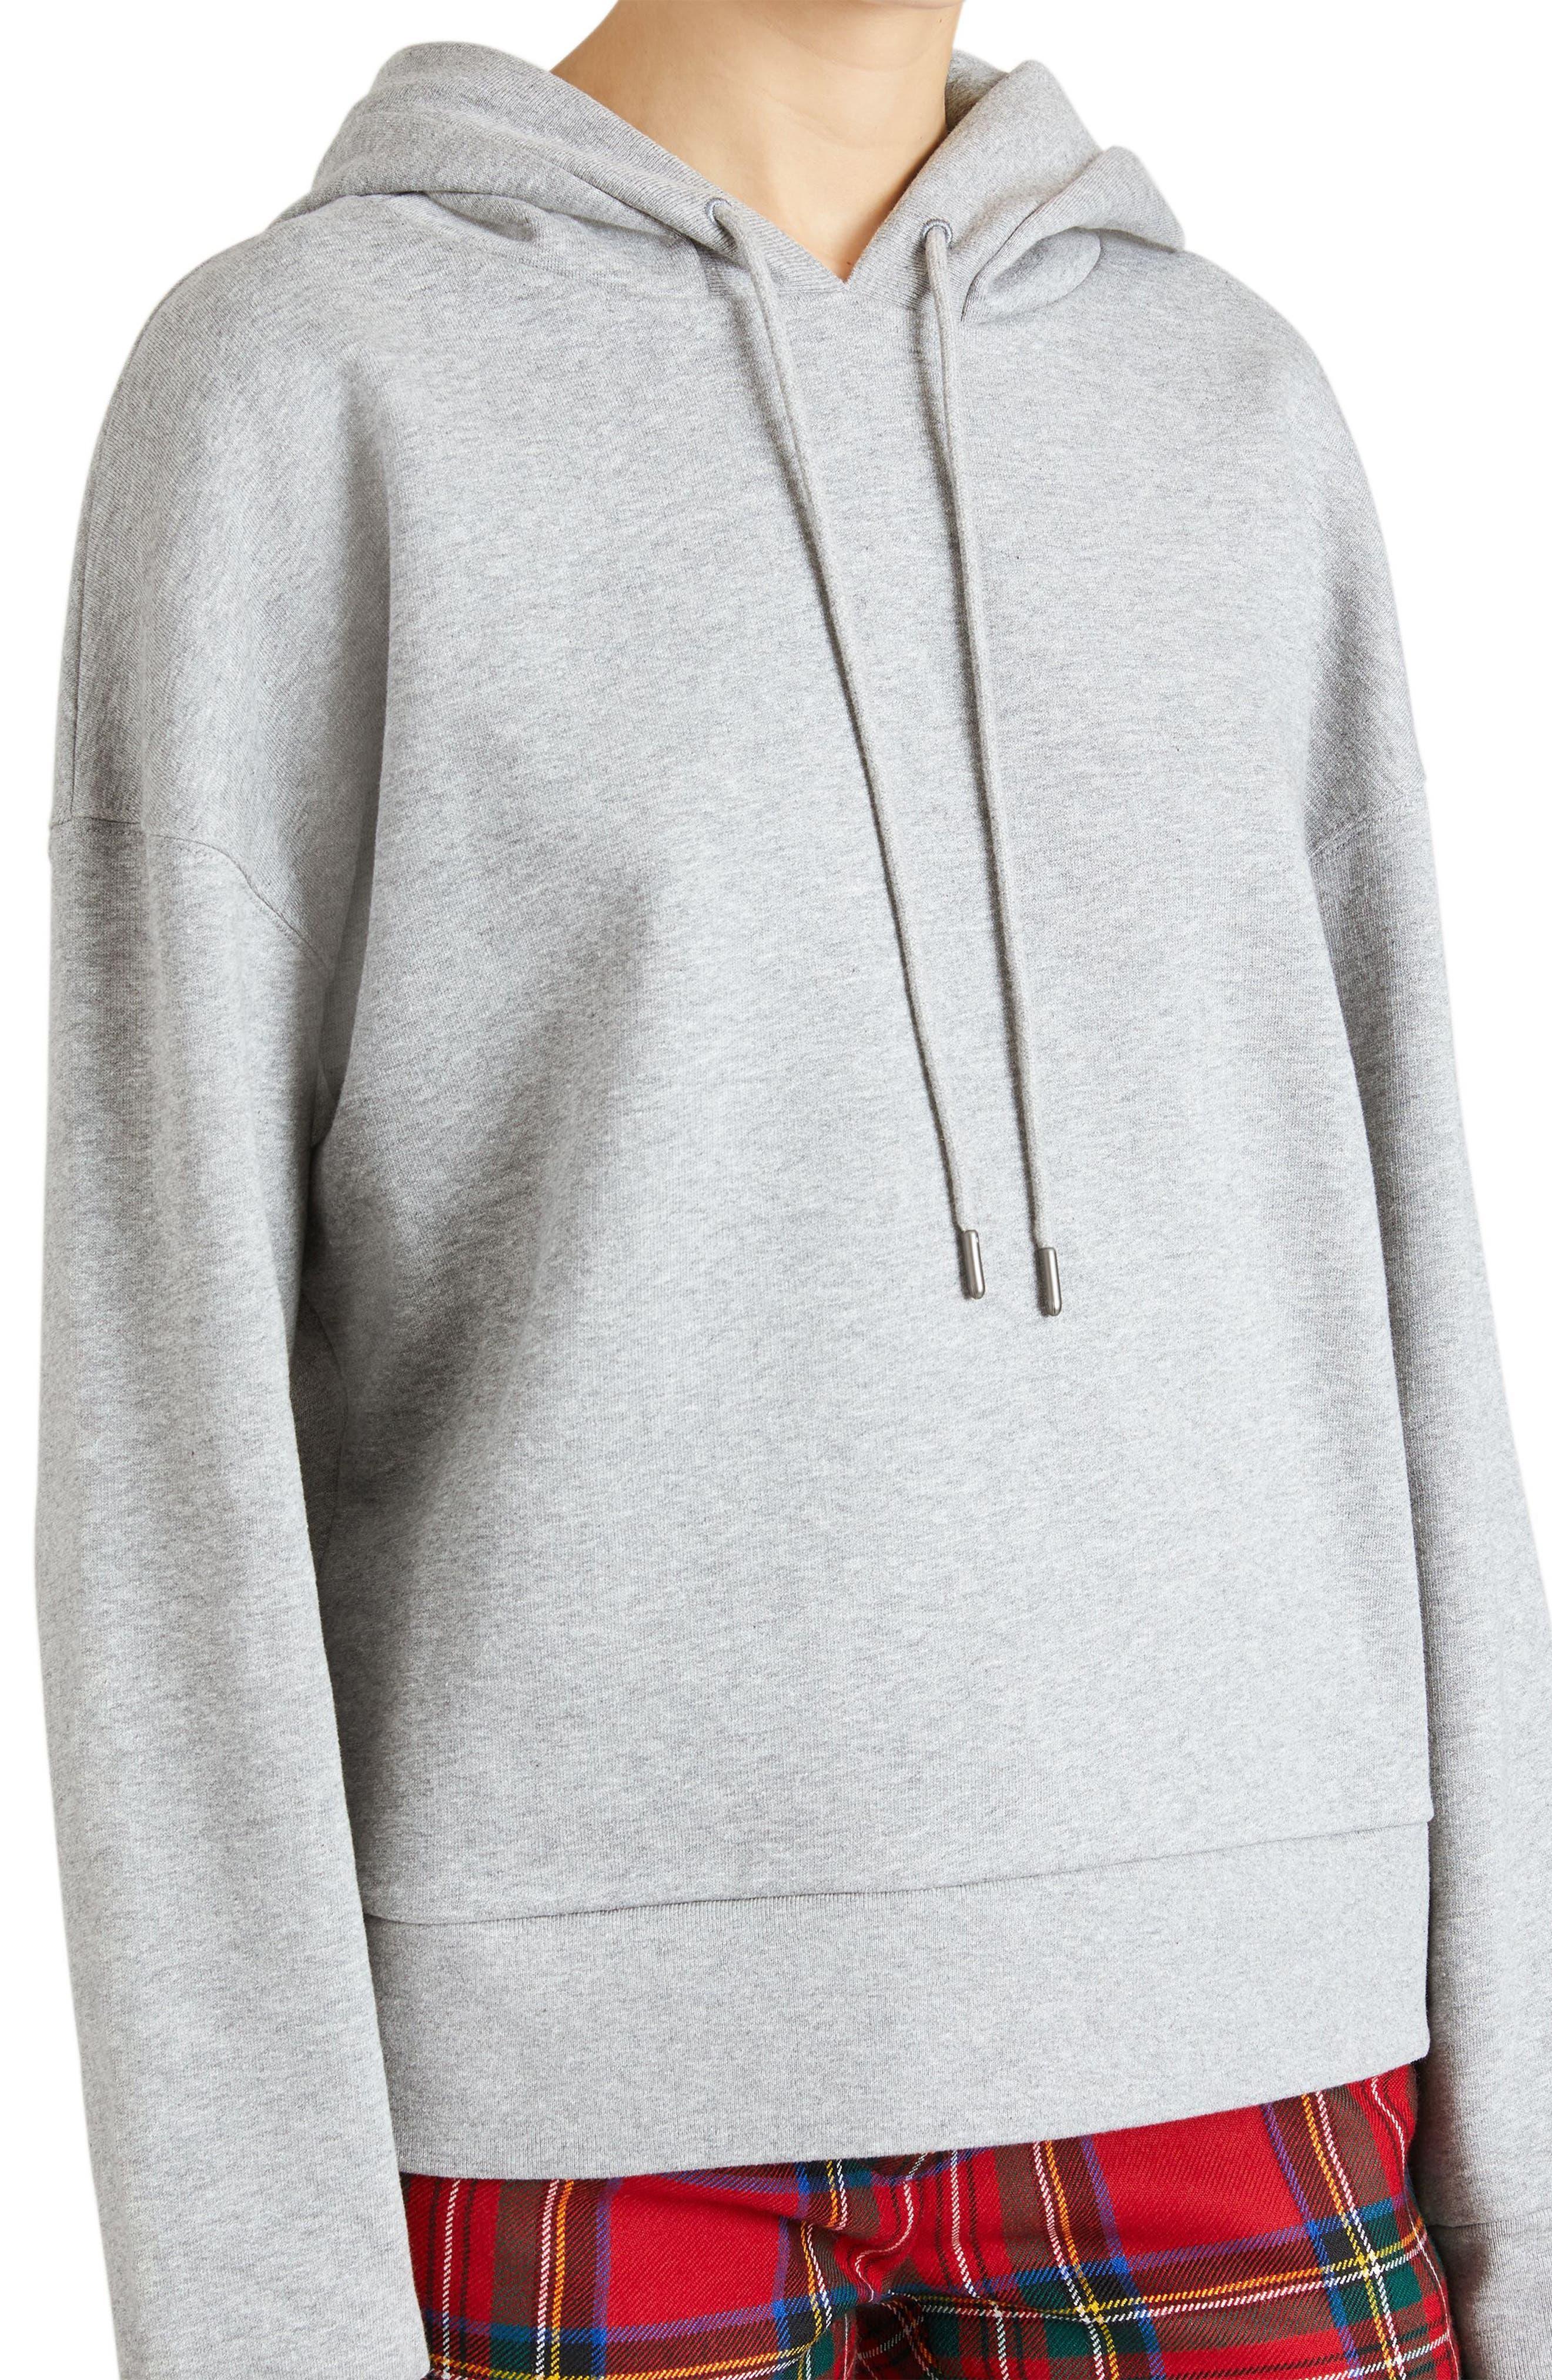 Escara Embroidered Hoodie,                         Main,                         color, Pale Grey Melange